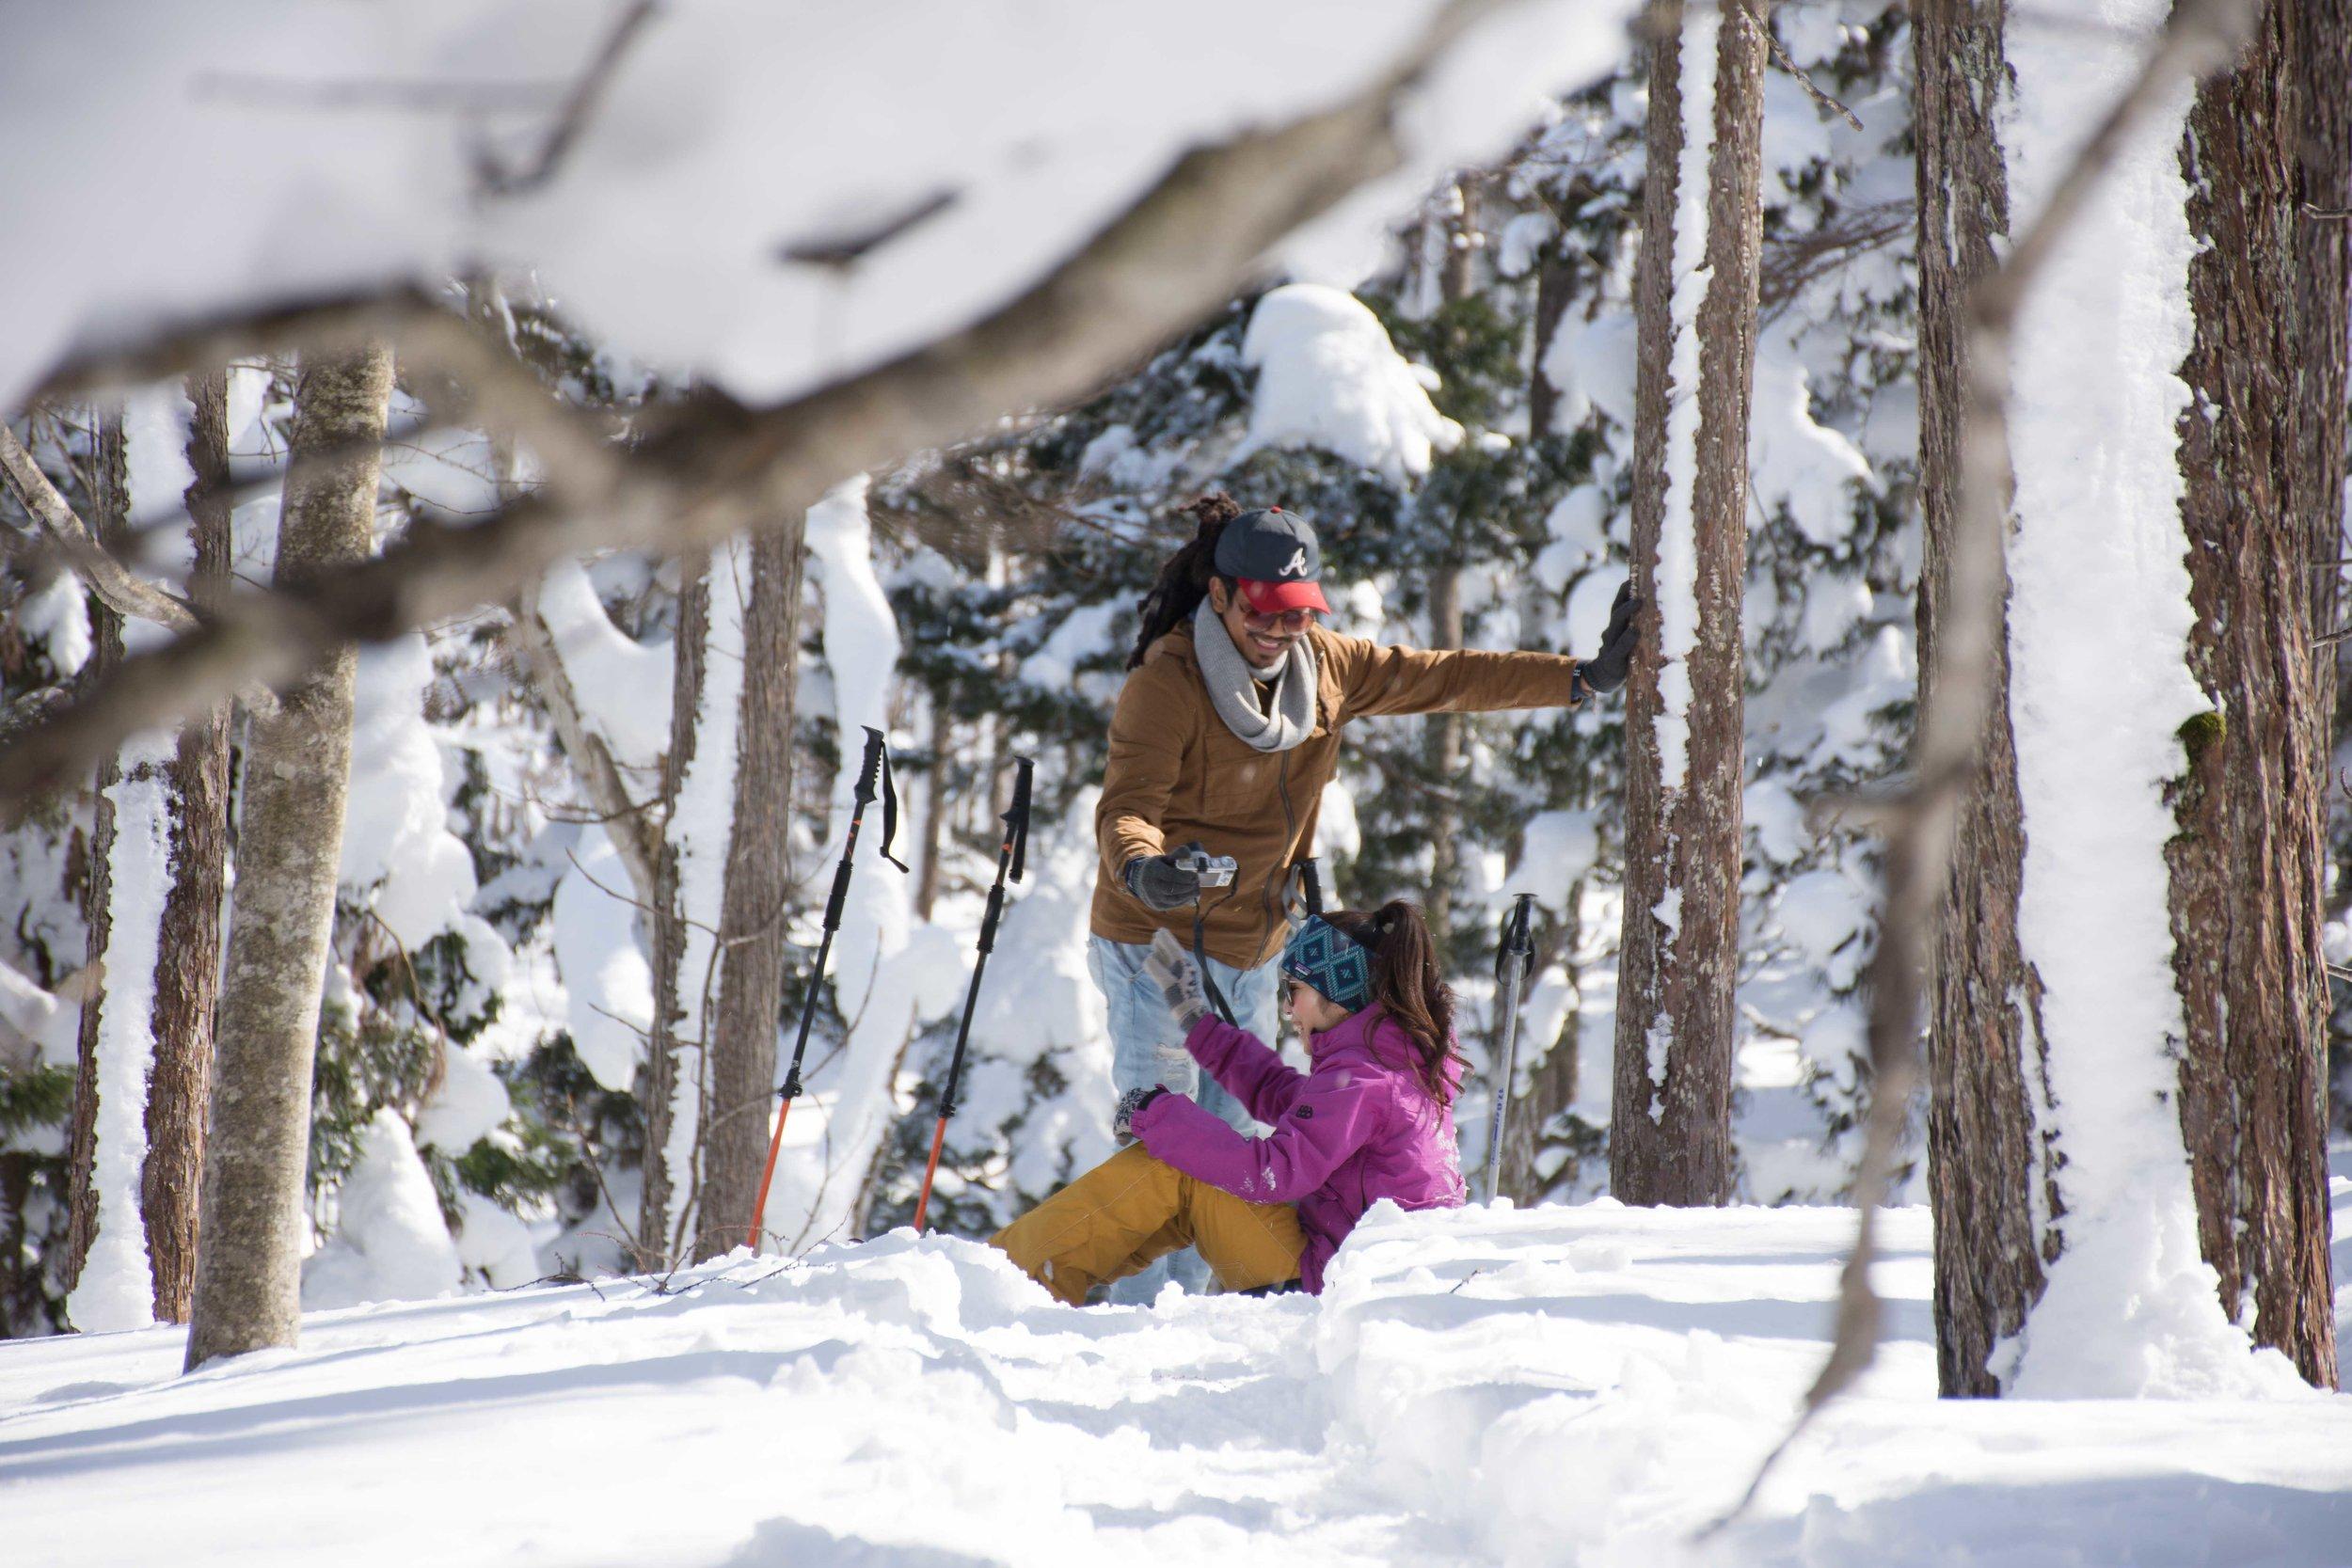 nozawa onsen snow shoe tour